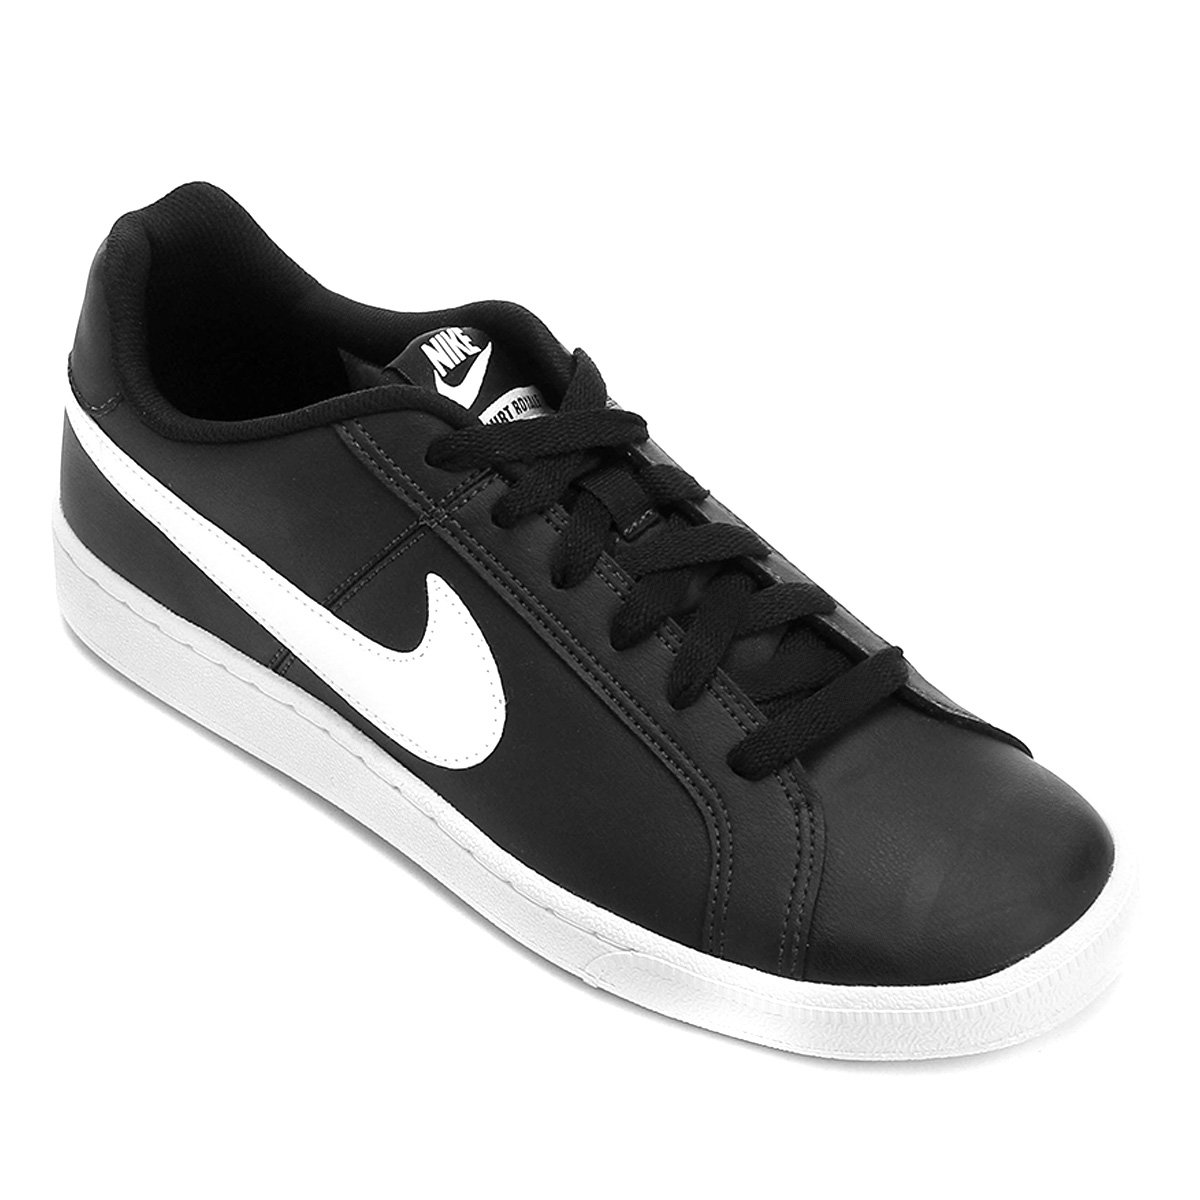 563f1805fb2 Tênis Couro Nike Court Royale Masculino - Preto e Branco - Compre Agora